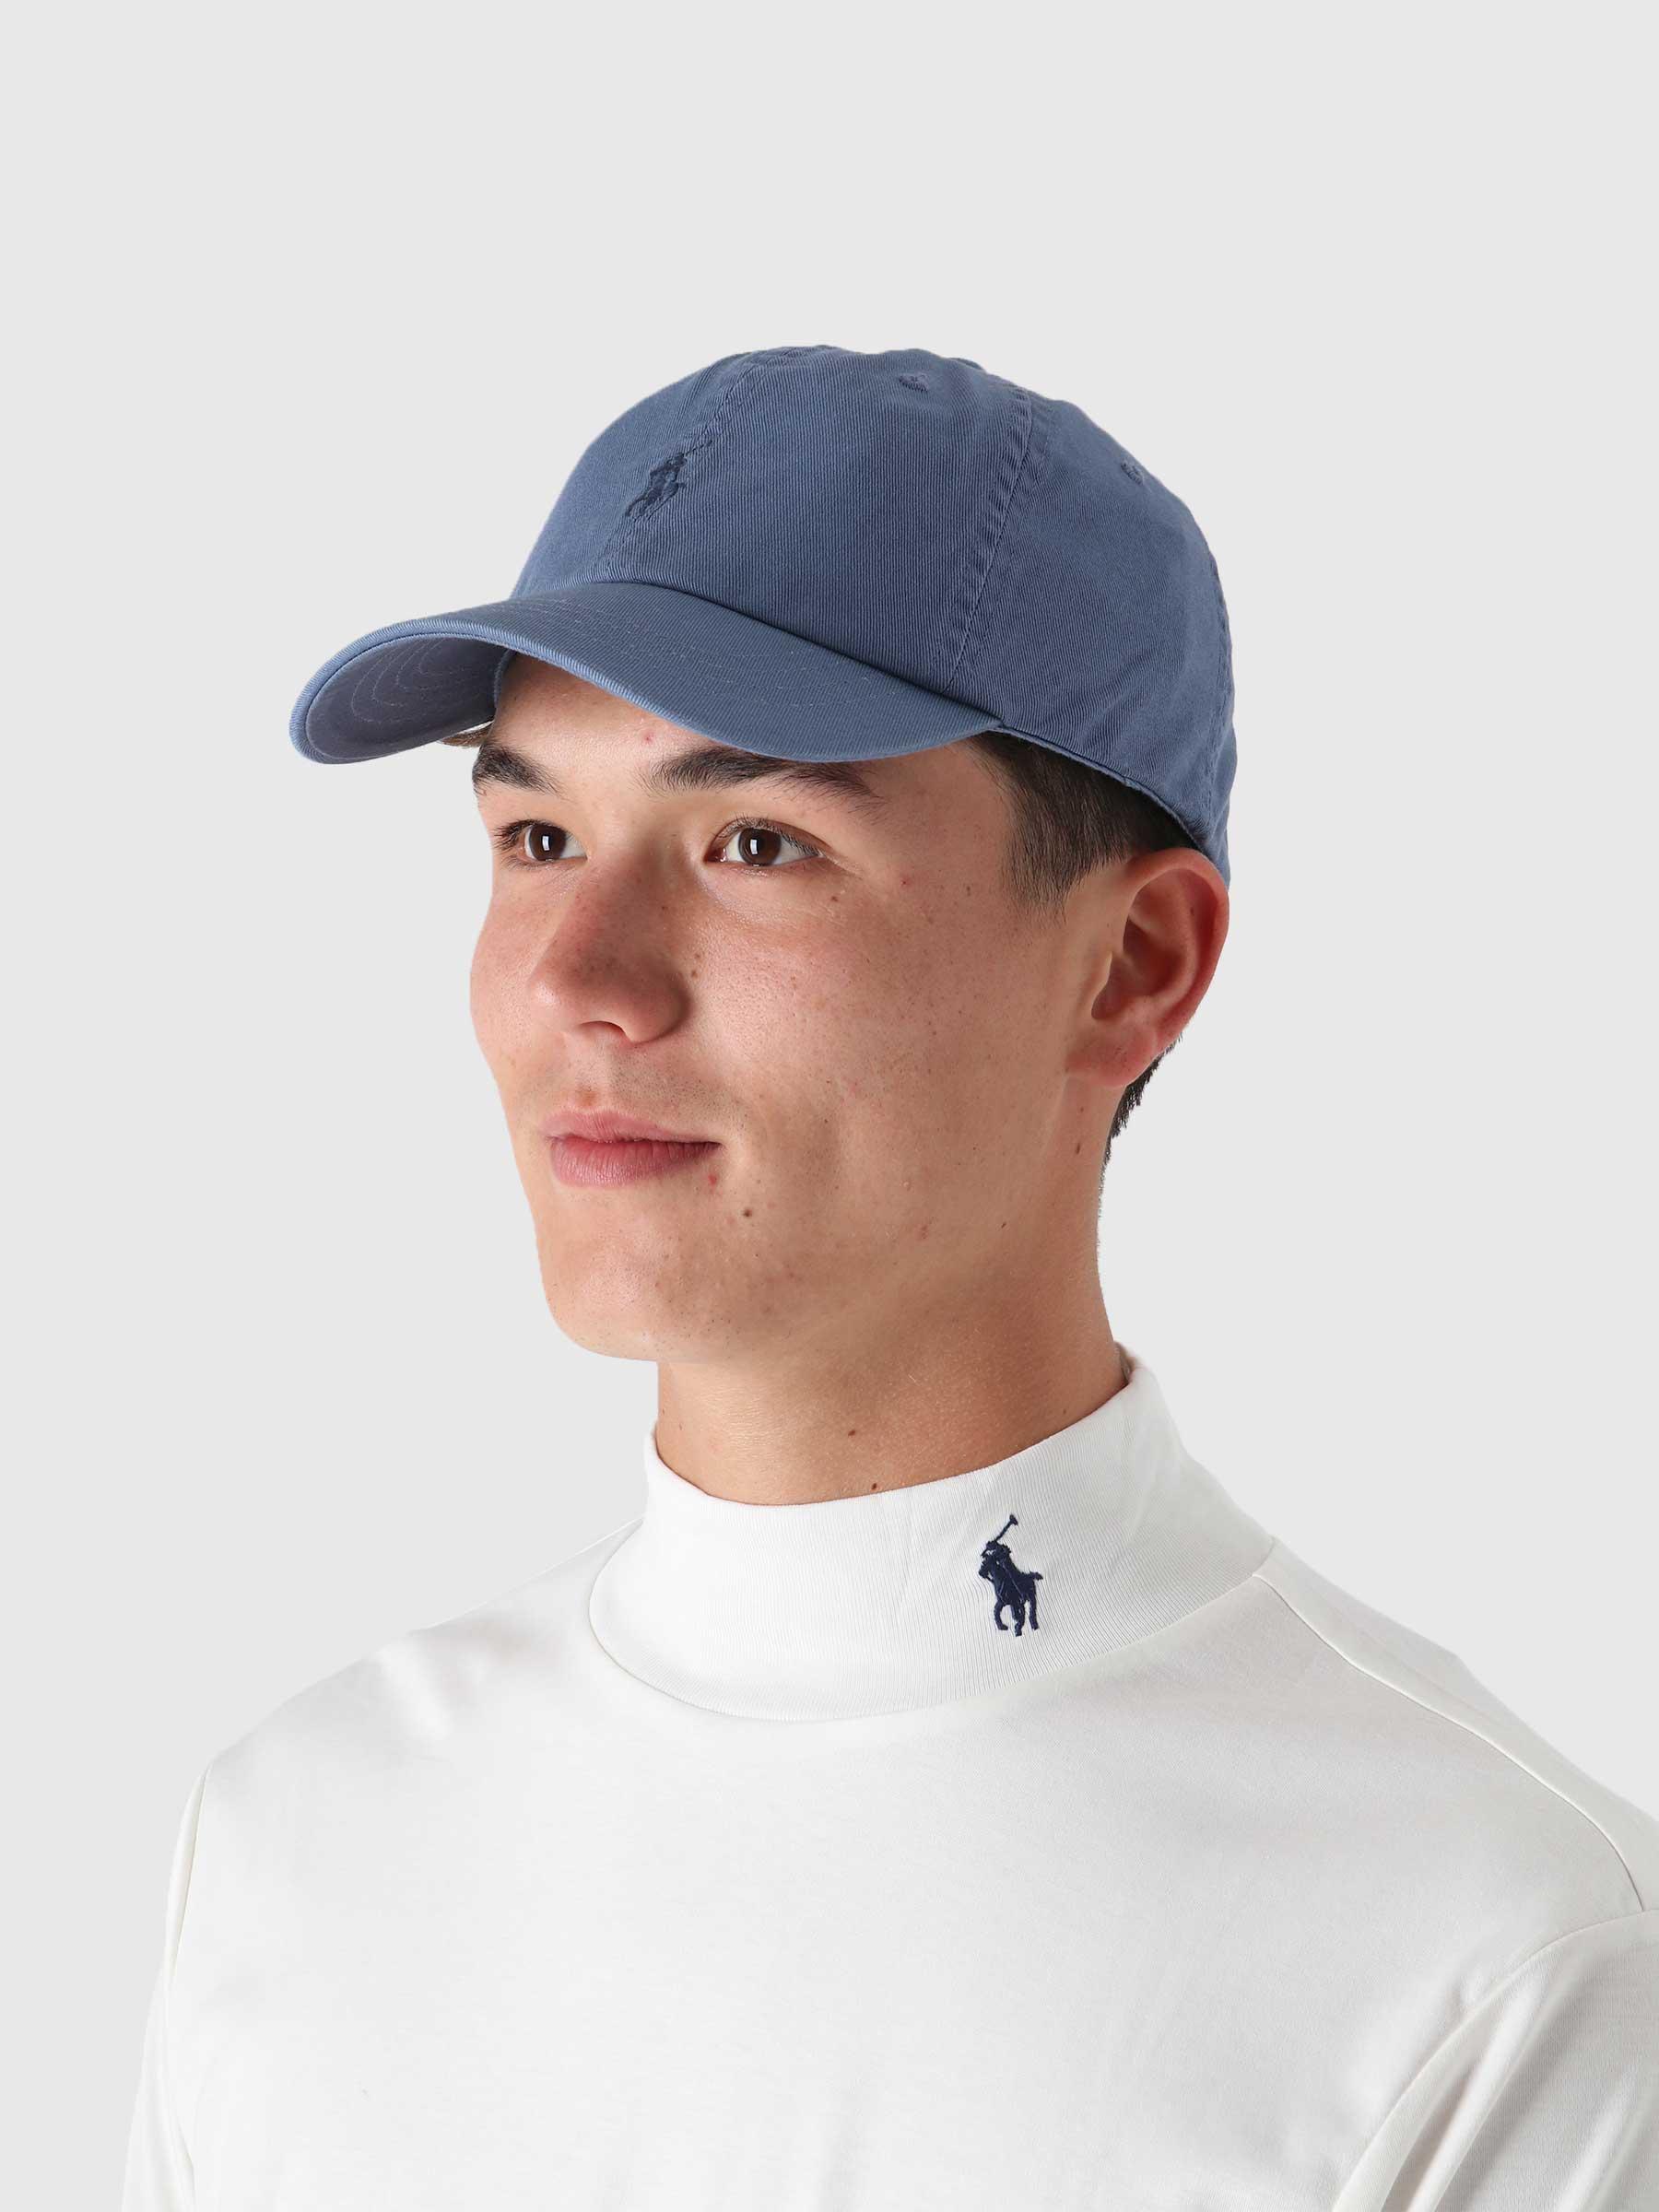 Classic Sport Cap Carson Blue Adirondack Navy 710548524003